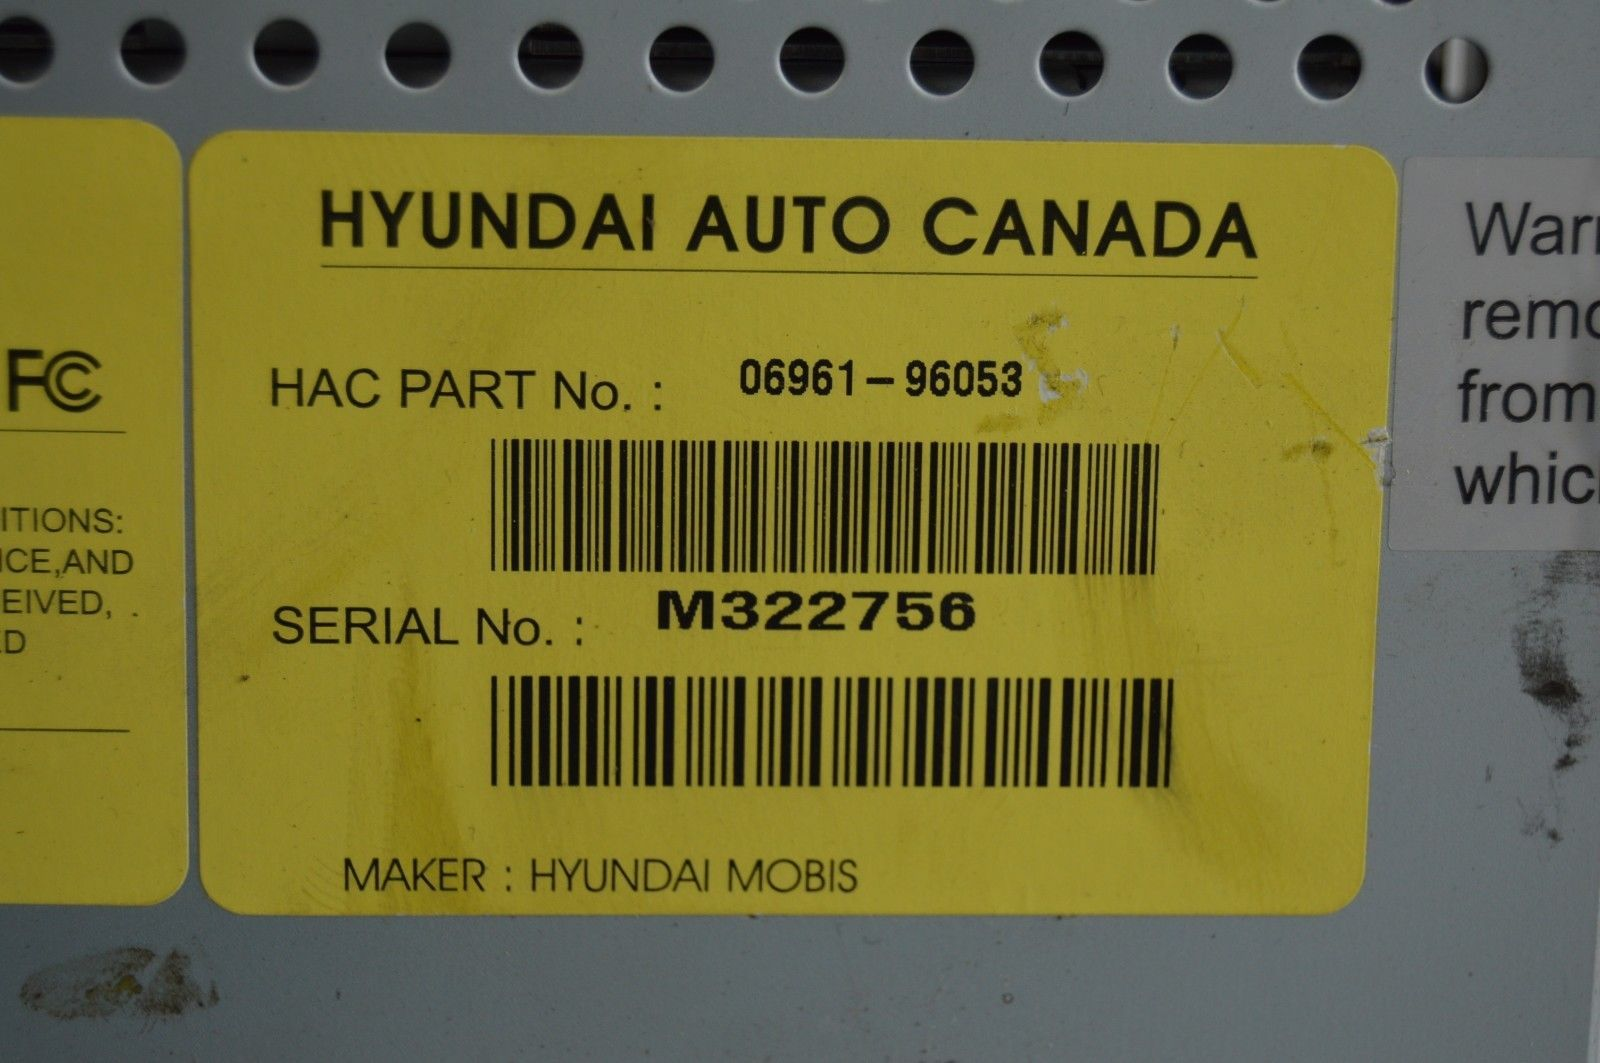 2007-2010 HYUNDAI ELANTRA RADIO CD PLAYER OEM RADIO 06961-96053 TESTED C54#002